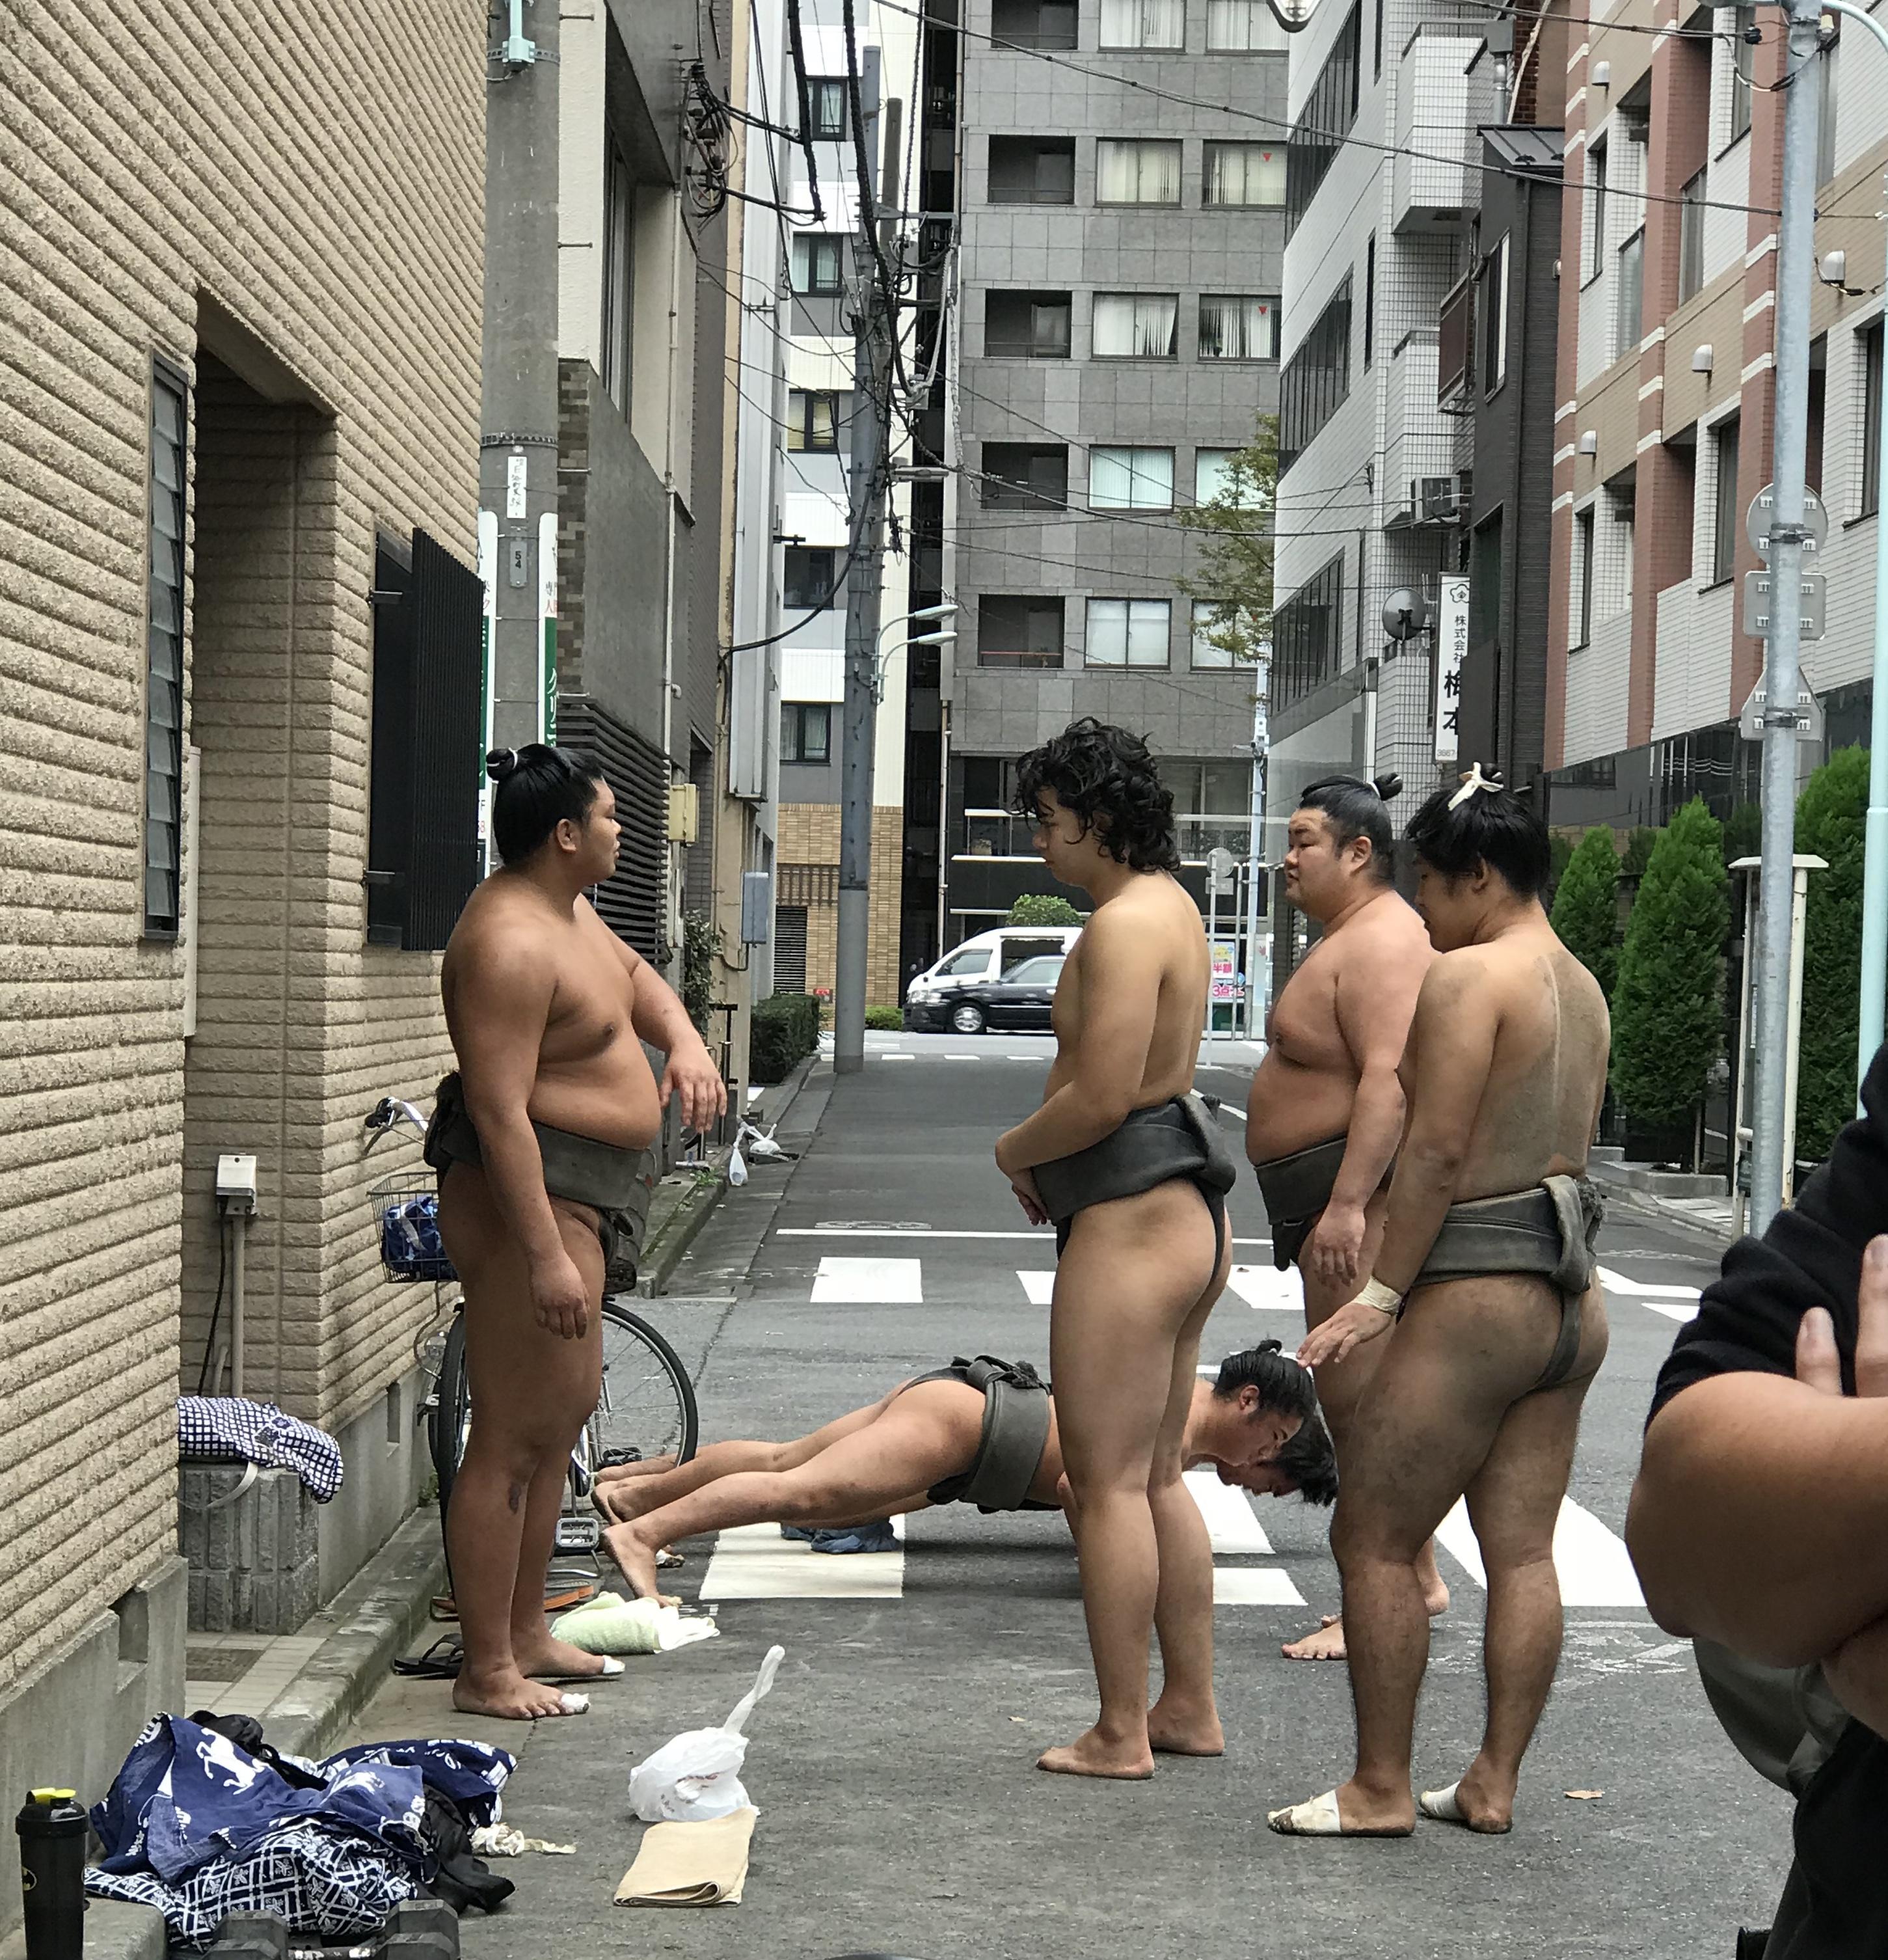 Männer im Lendenschurz